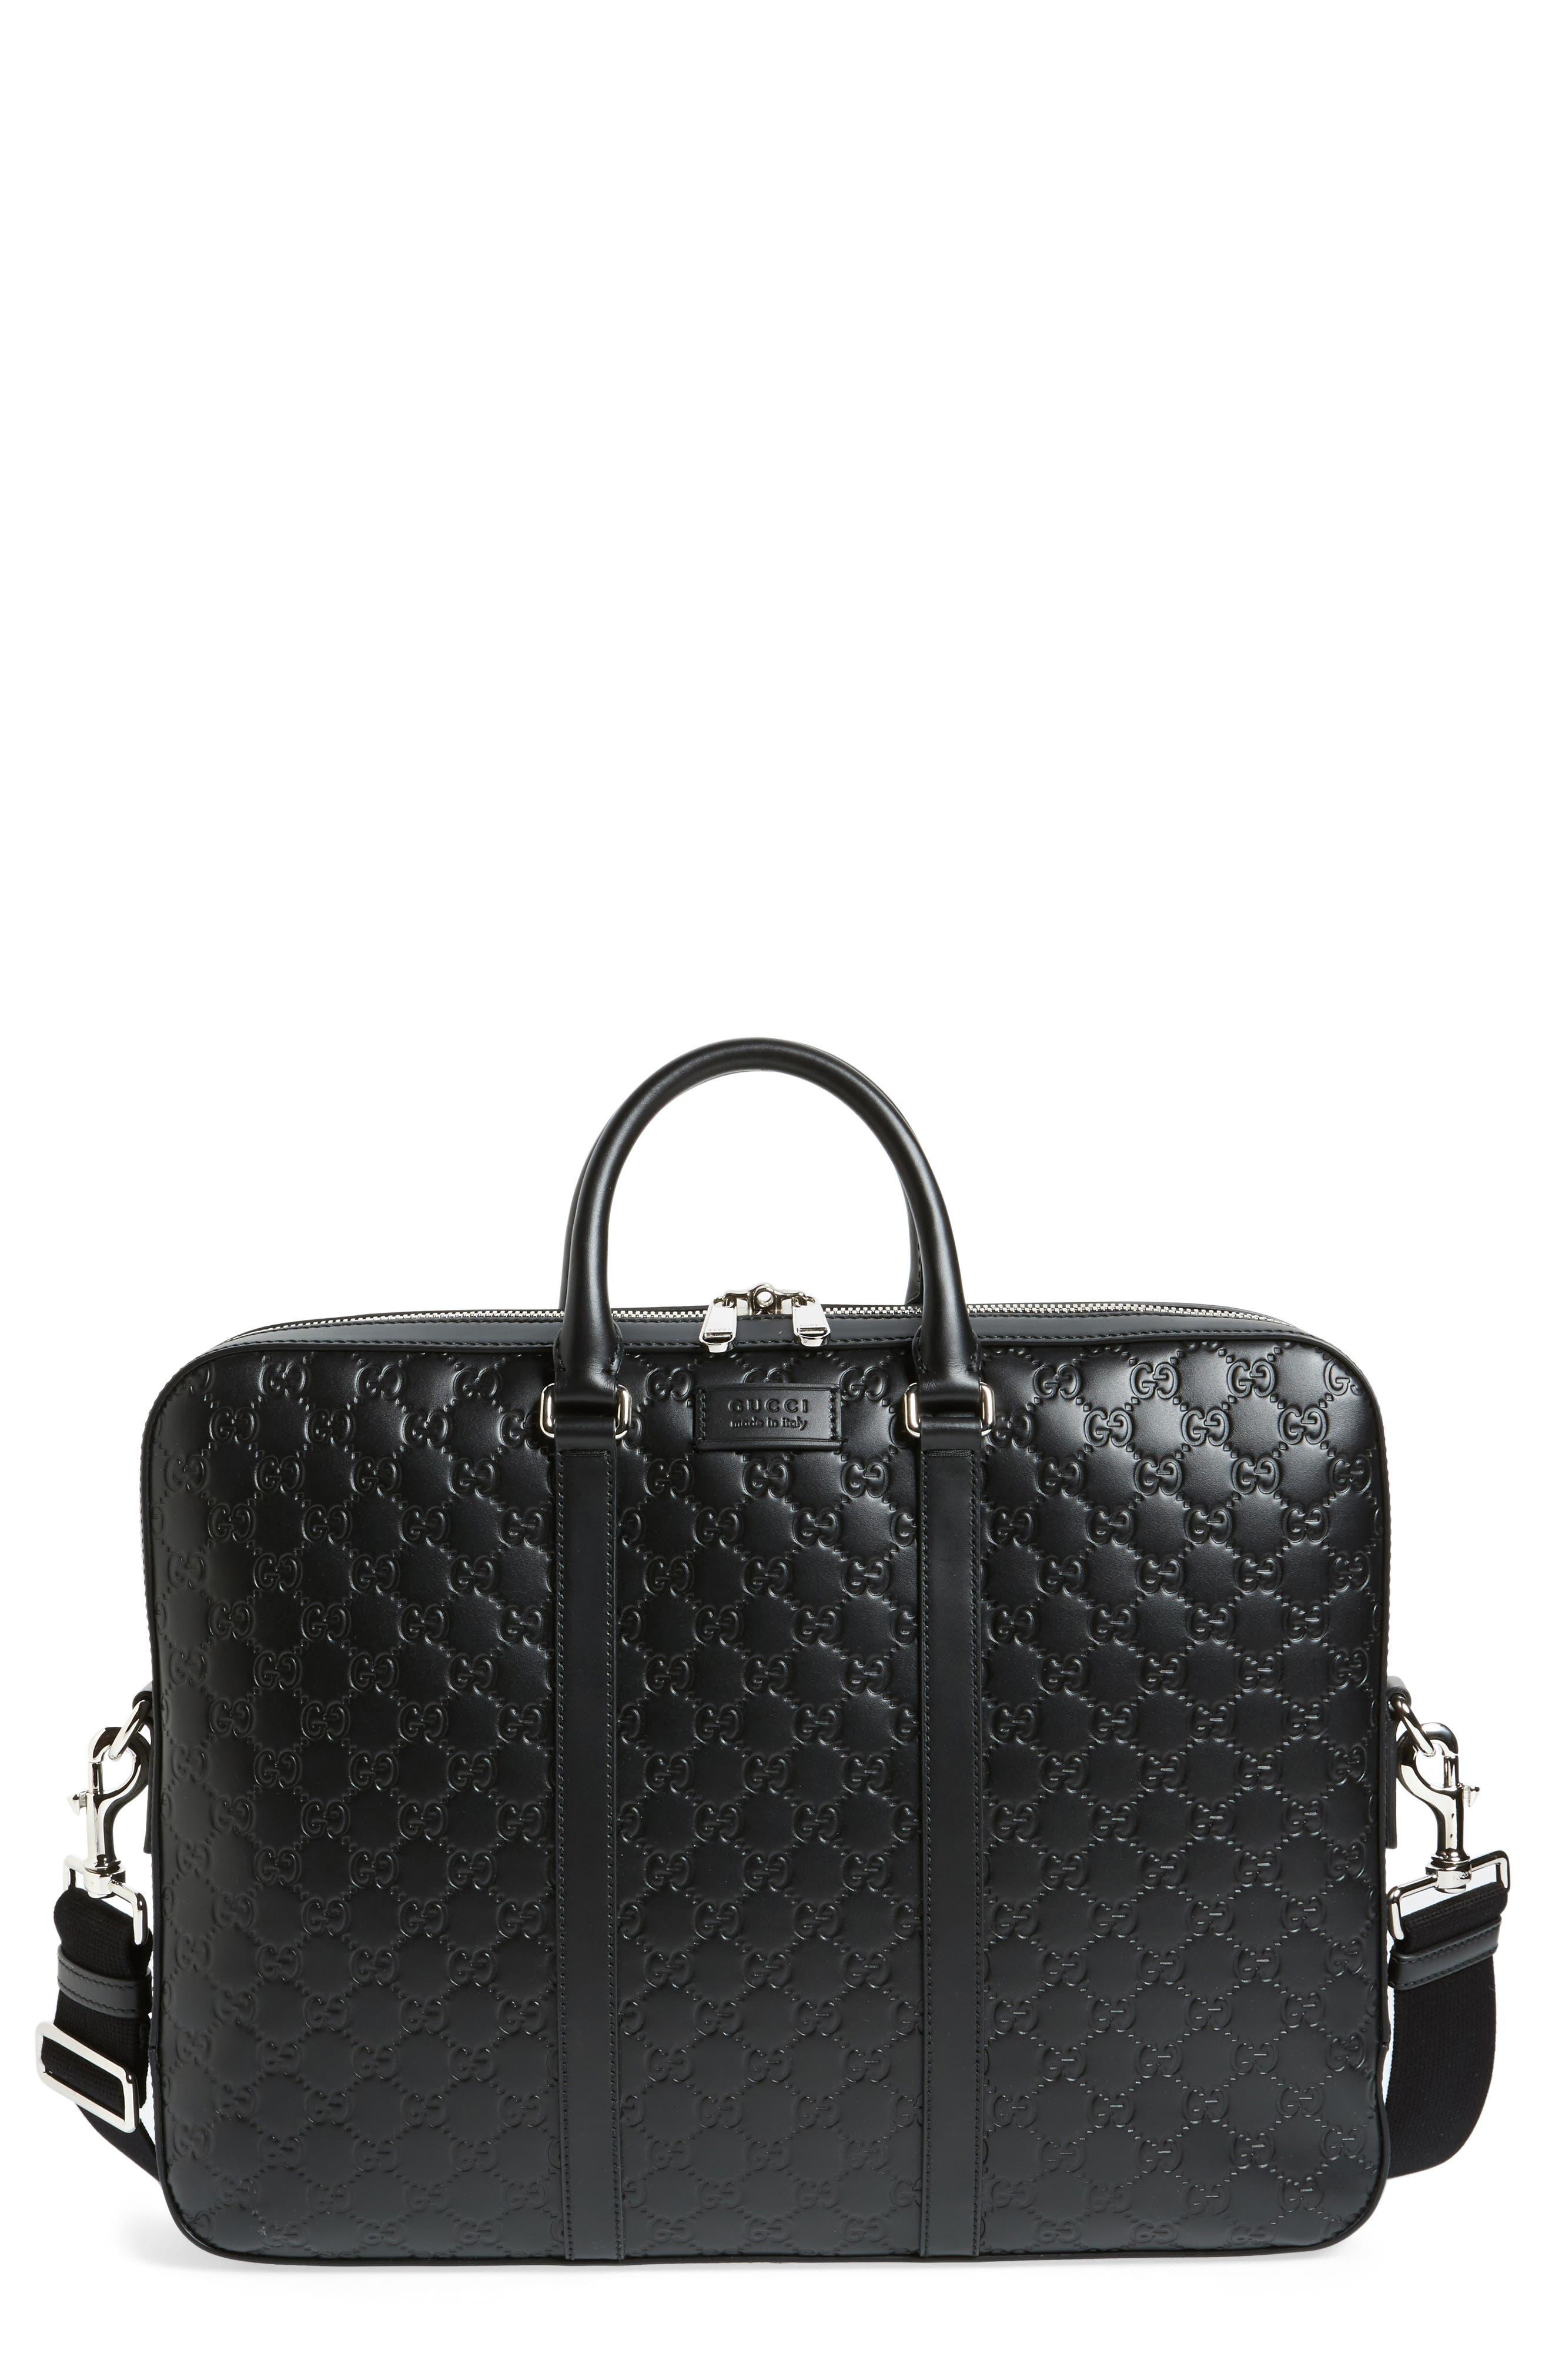 Signature Leather Briefcase,                             Main thumbnail 1, color,                             001